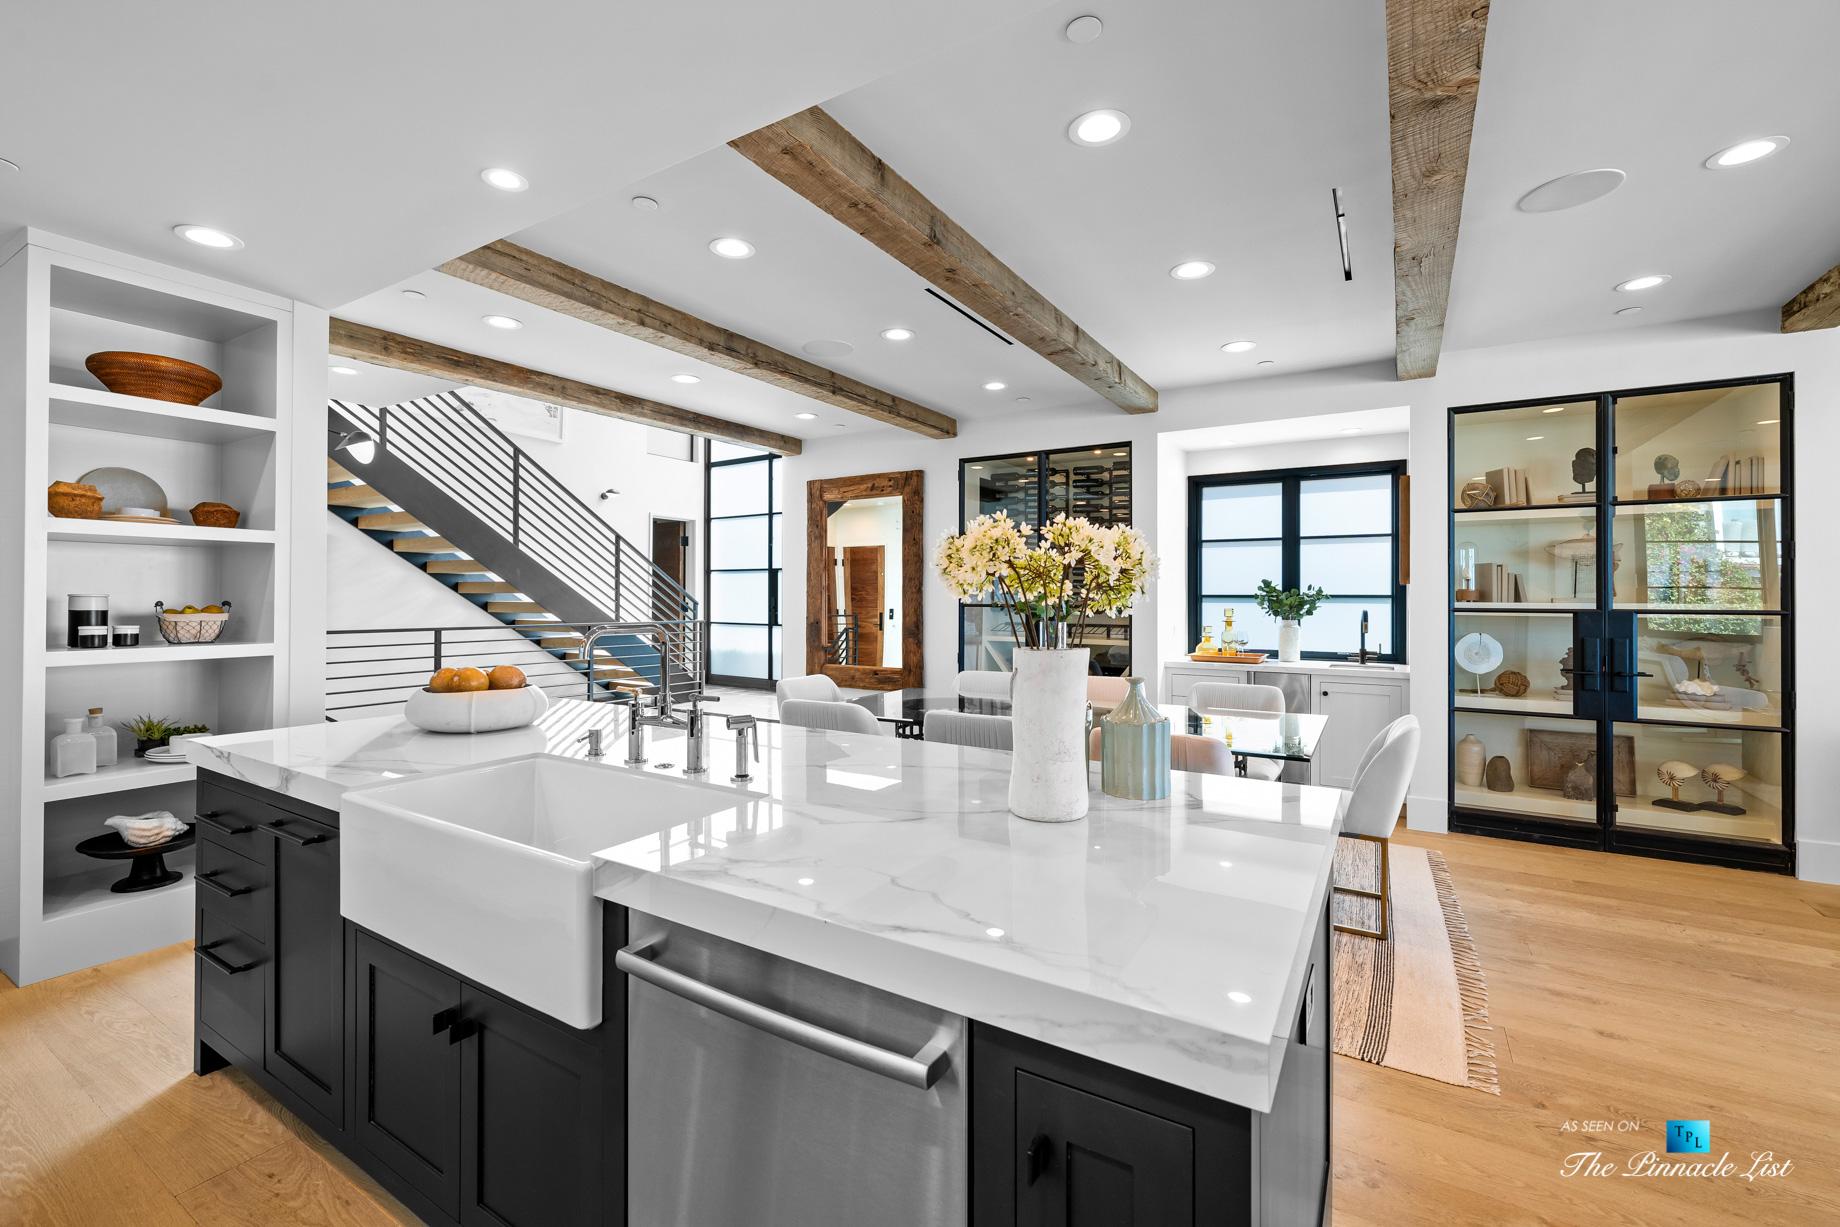 508 The Strand, Manhattan Beach, CA, USA – Kitchen Island – Luxury Real Estate – Oceanfront Home